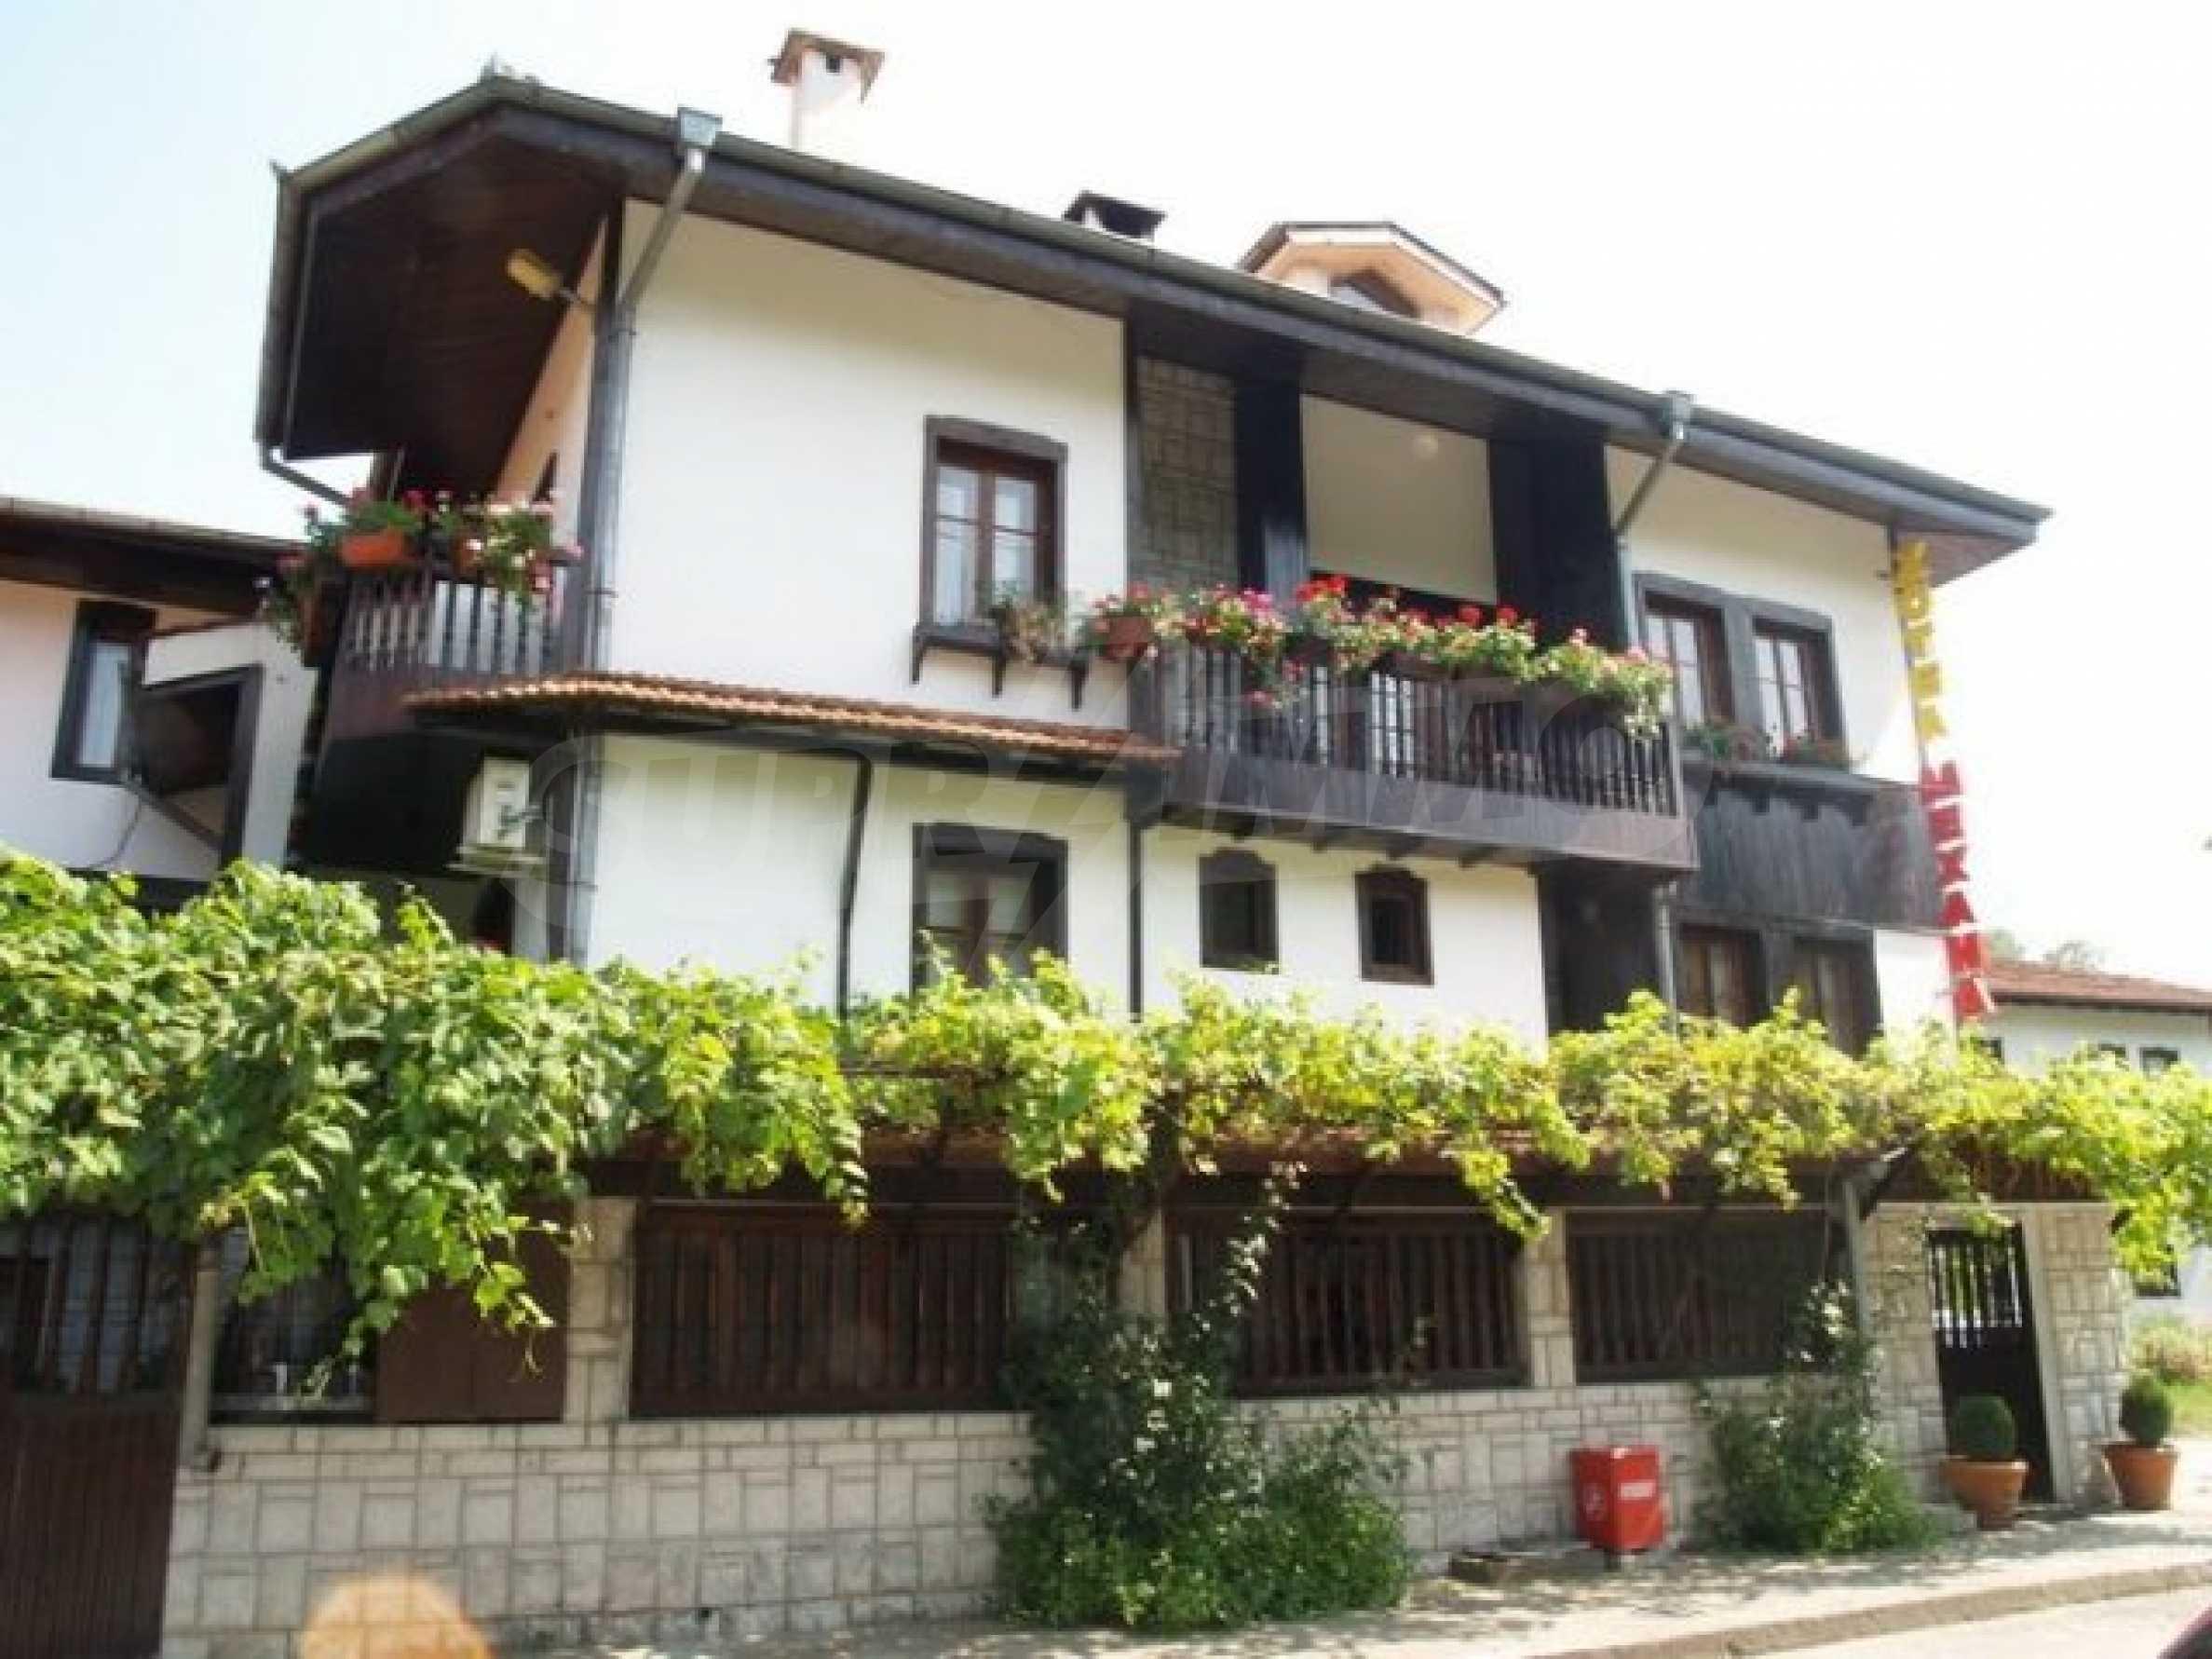 Hotelanlage mit Restaurant am Ufer des Flusses Osam in Lovech